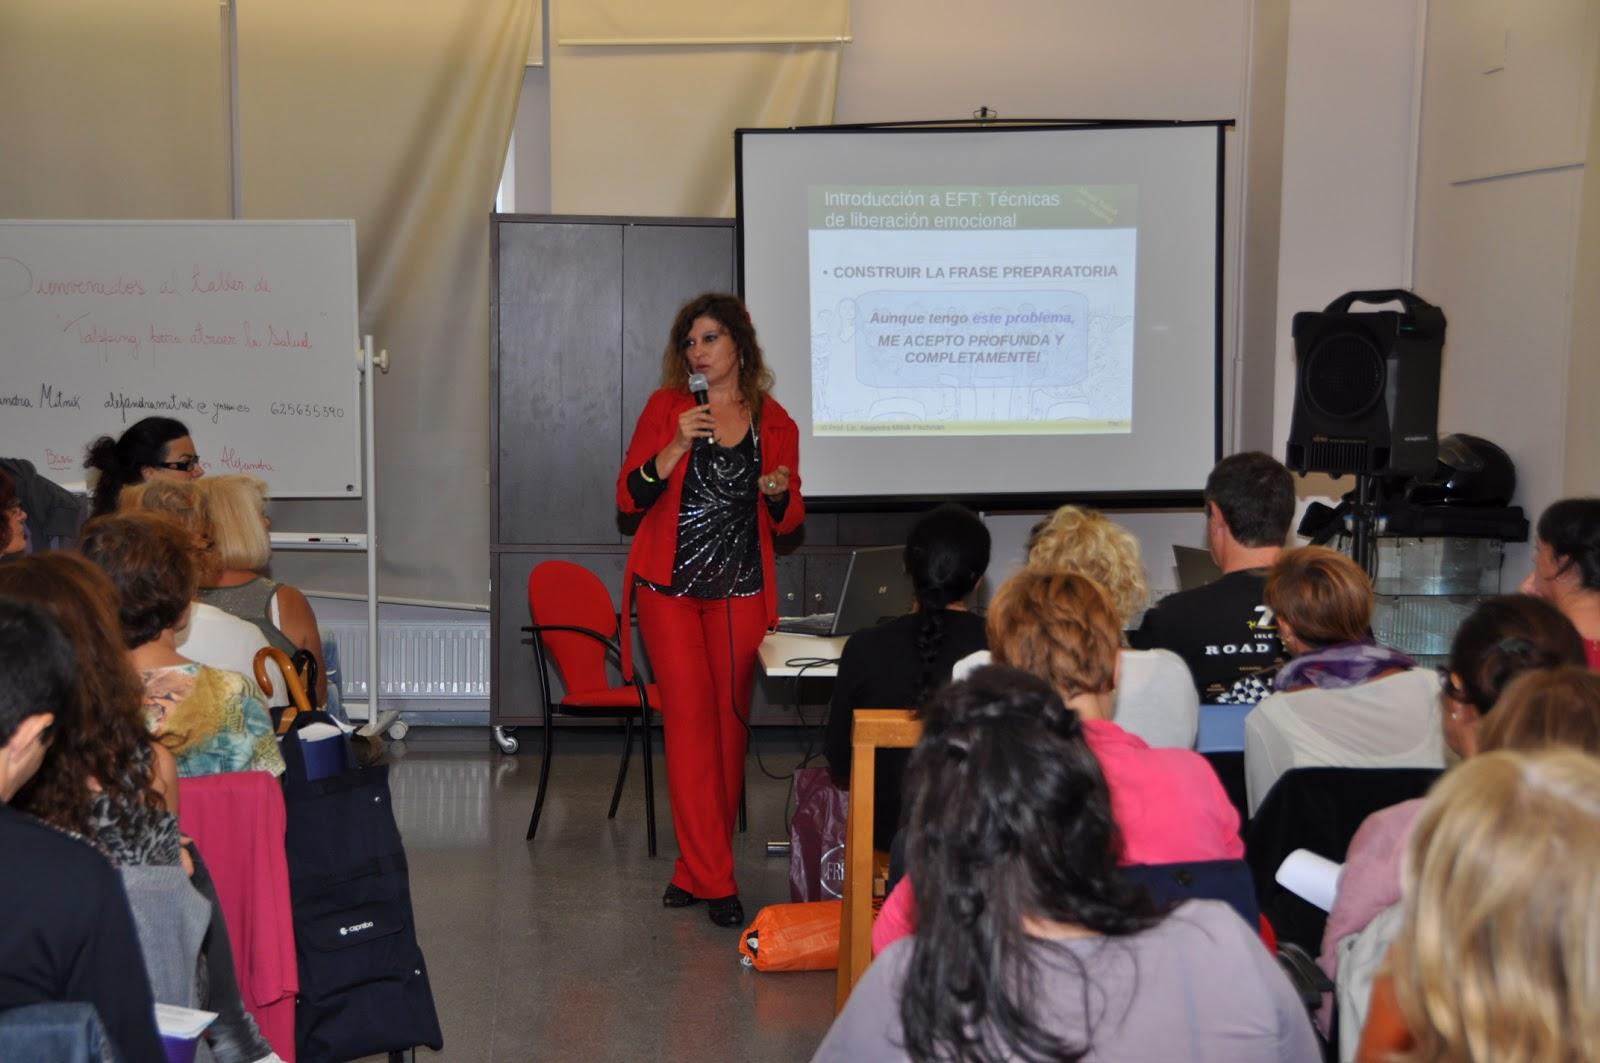 Terapias Energéticas Con Alejandra Mitnik Eft Tapping